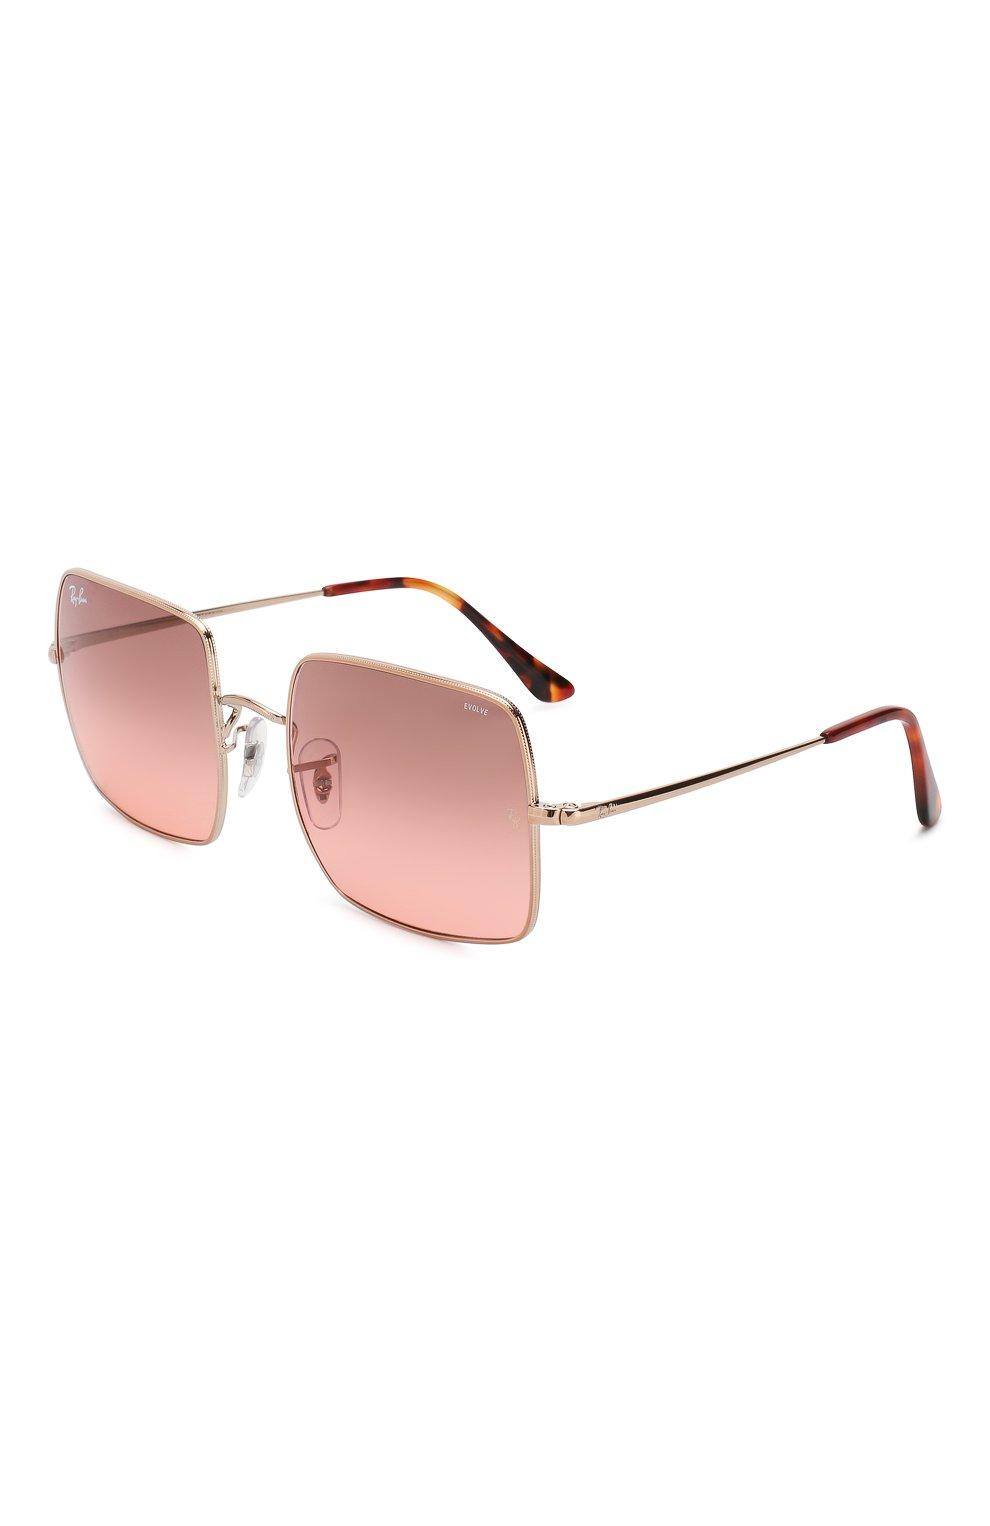 Женские солнцезащитные очки RAY-BAN розового цвета, арт. 1971-9151AA | Фото 1